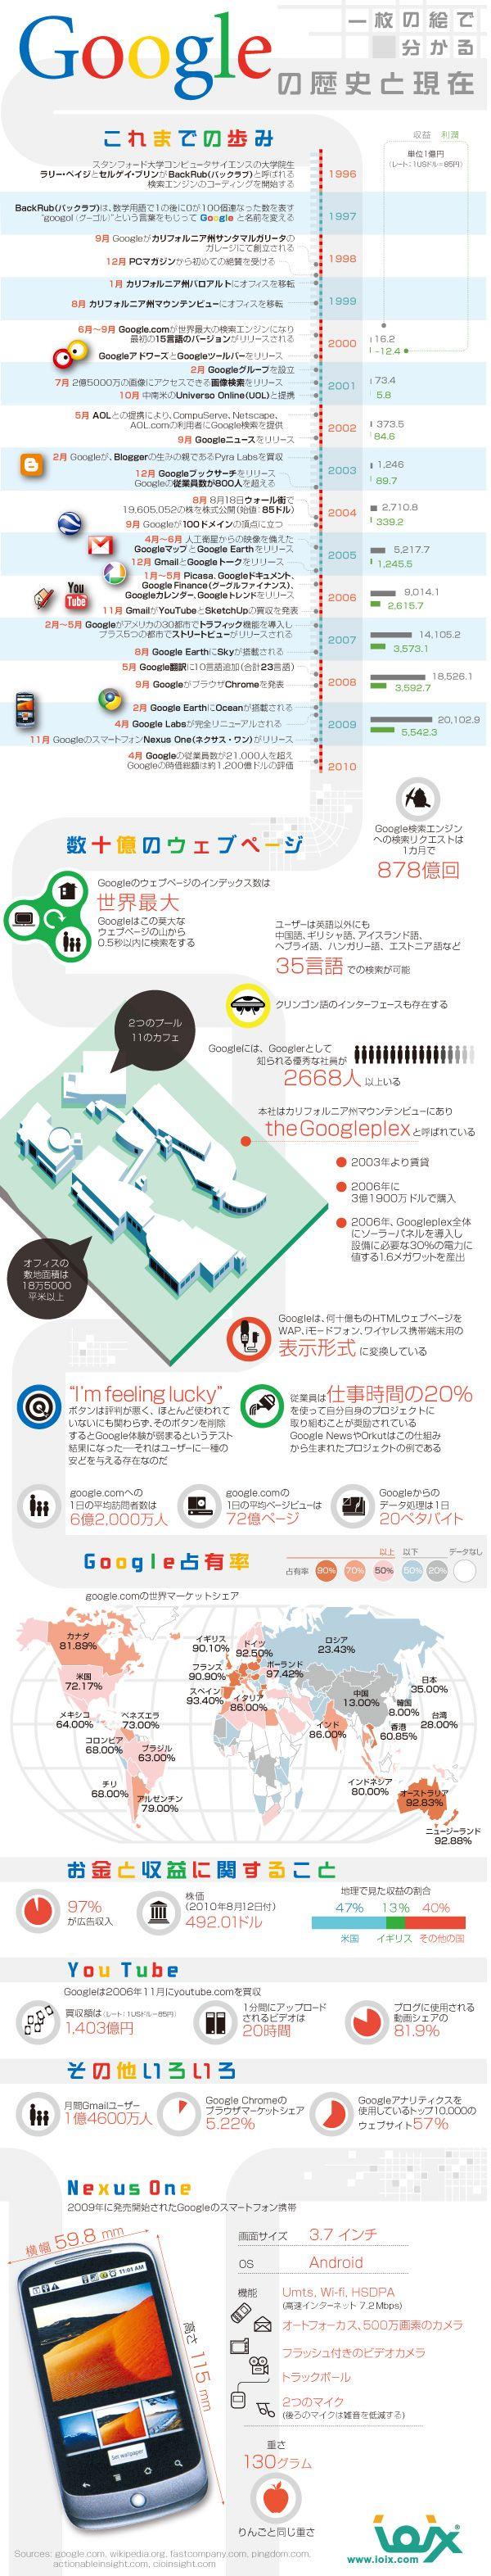 google_600px